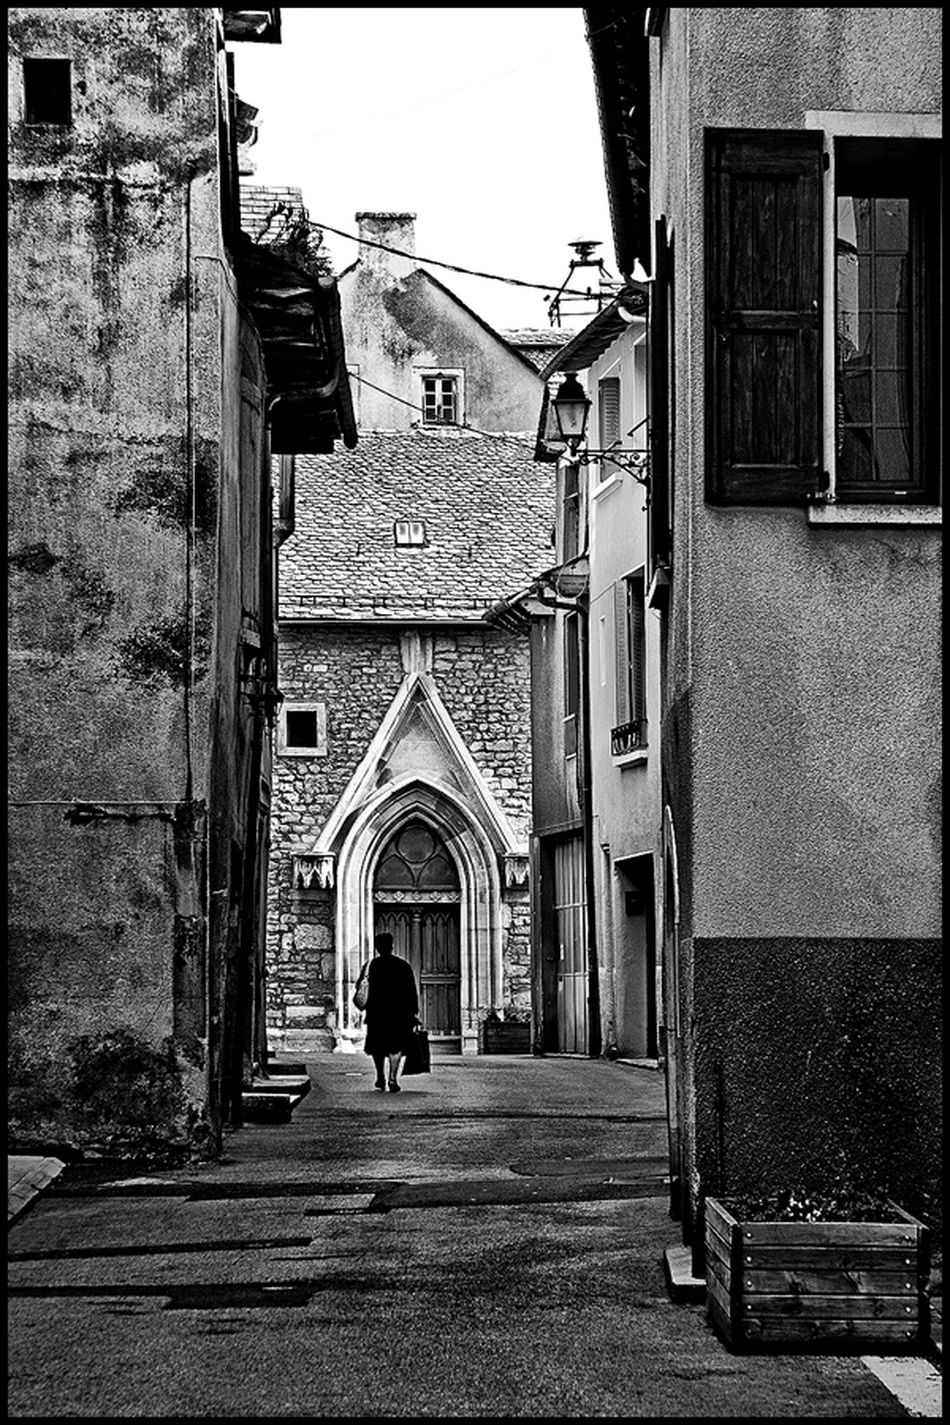 Black & White Black And White Blackandwhite City City Life Old Street Street Photography Streetphoto_bw Streetphotography